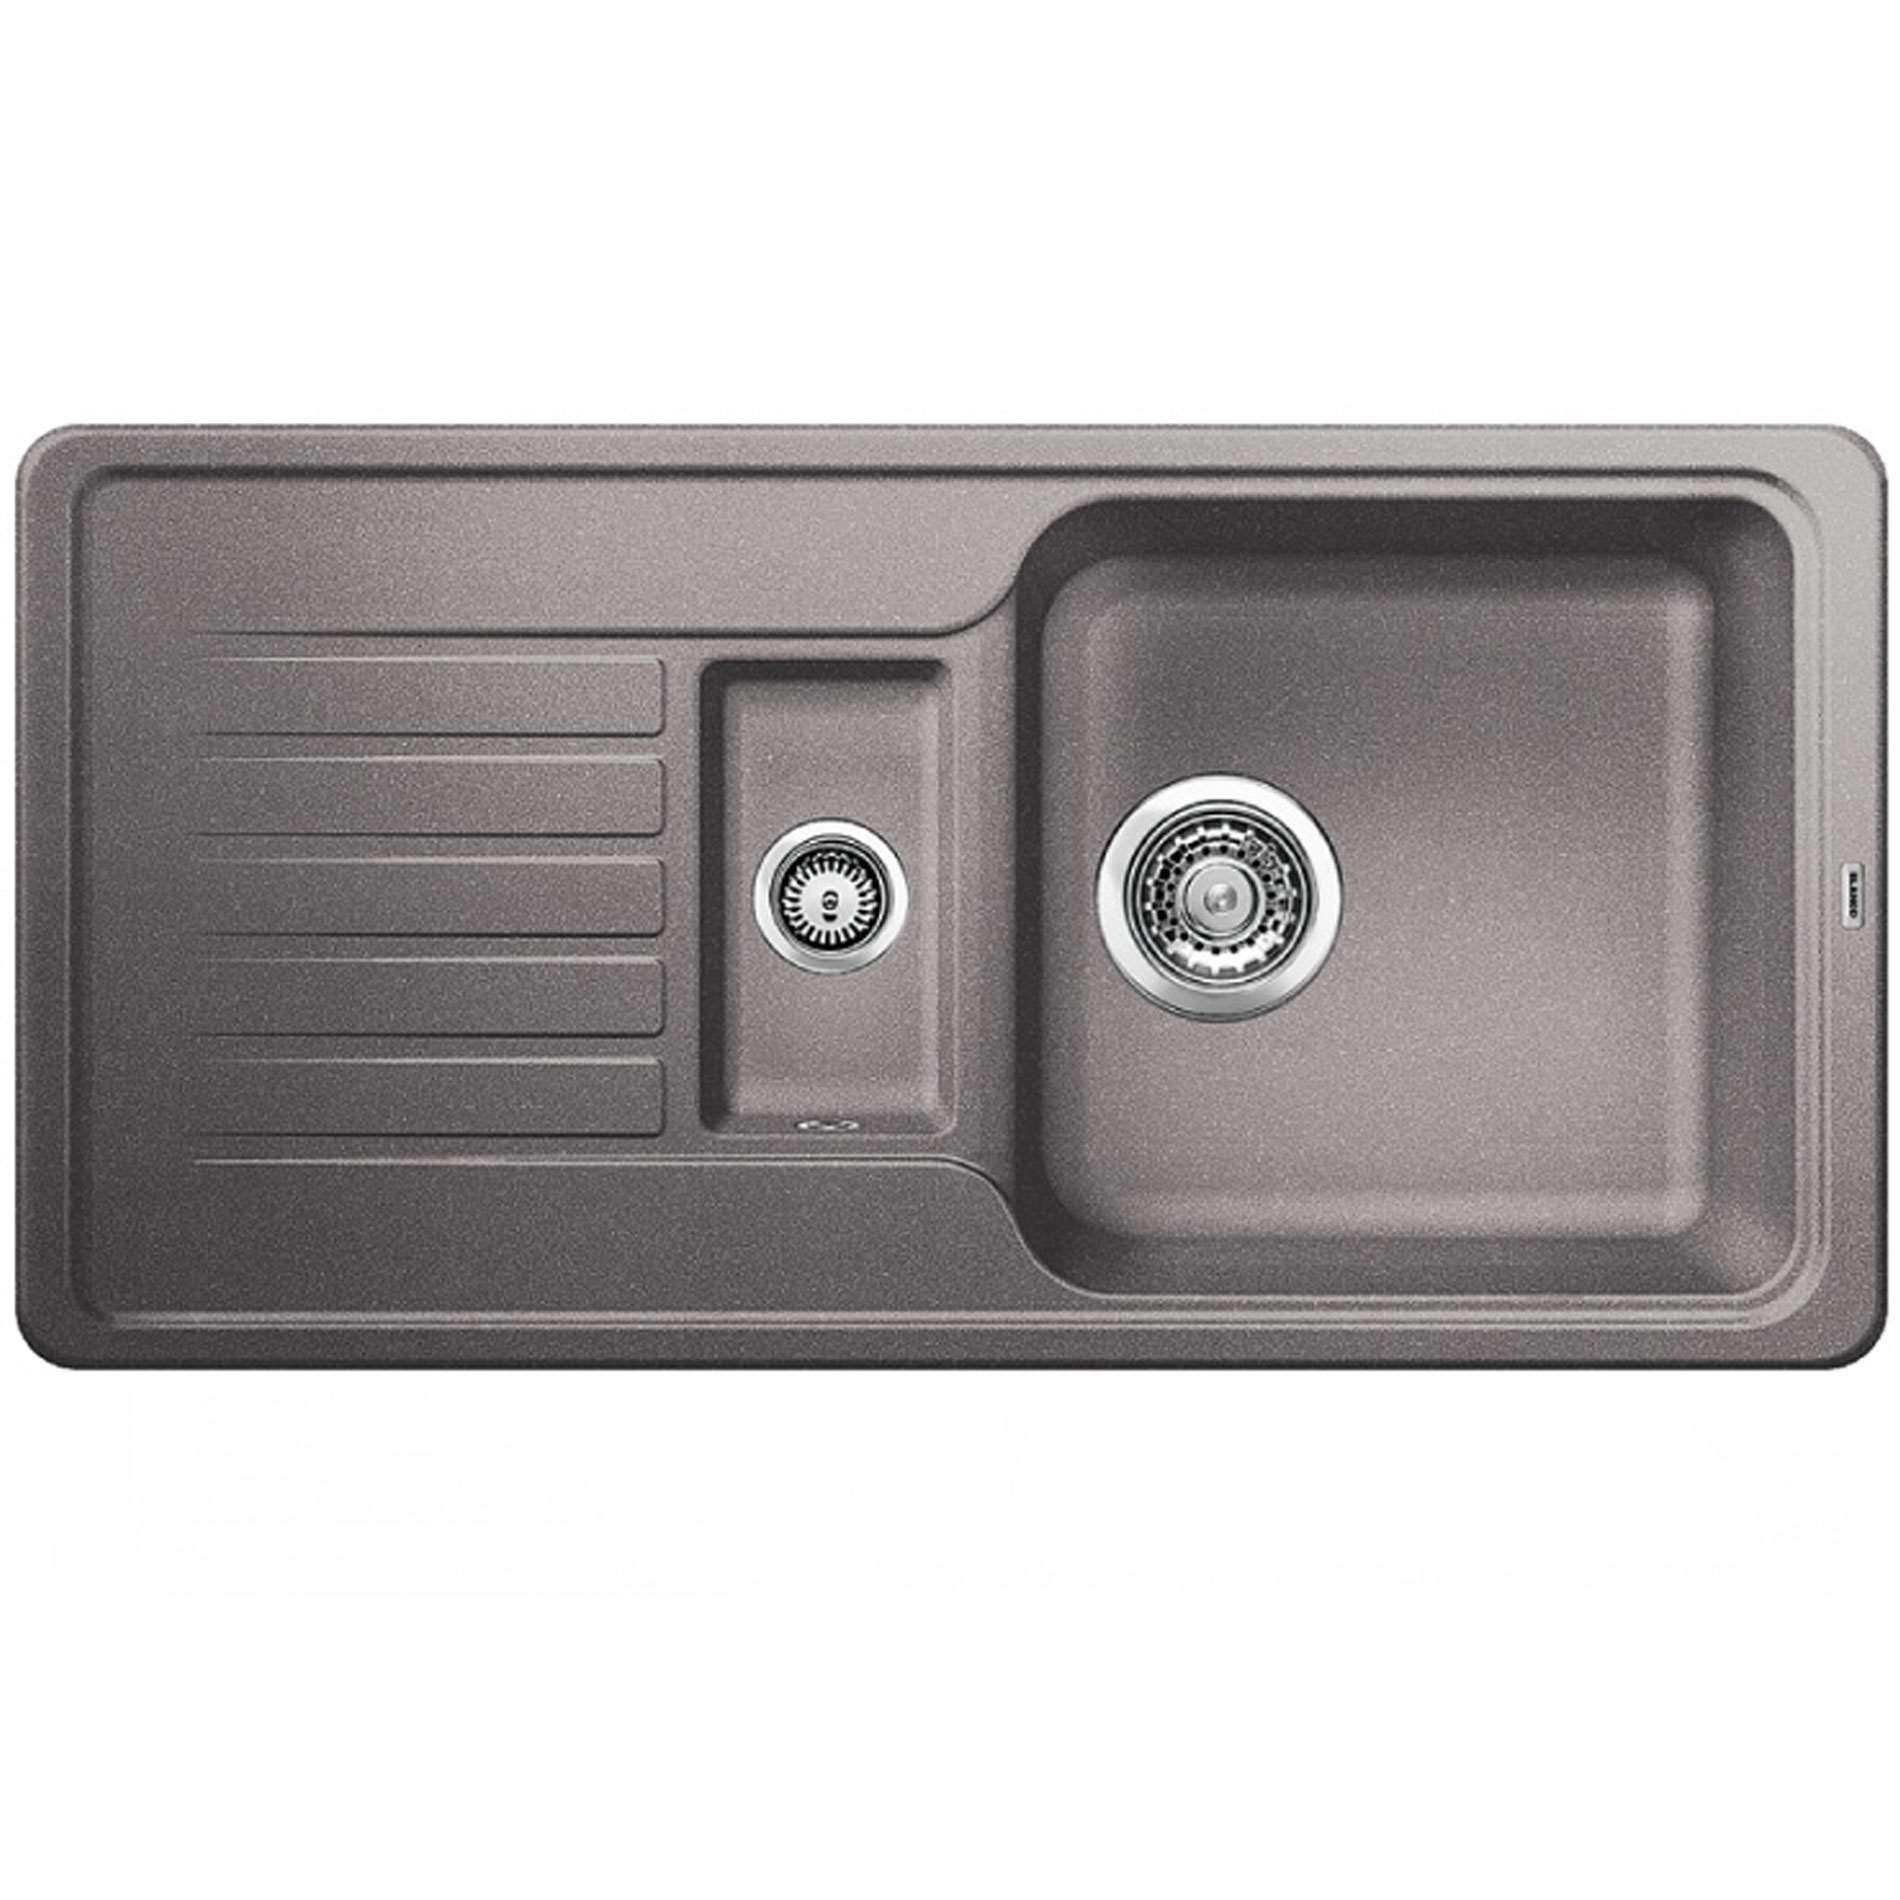 Blanco Favos 6 S Alumetallic Silgranit Sink Kitchen